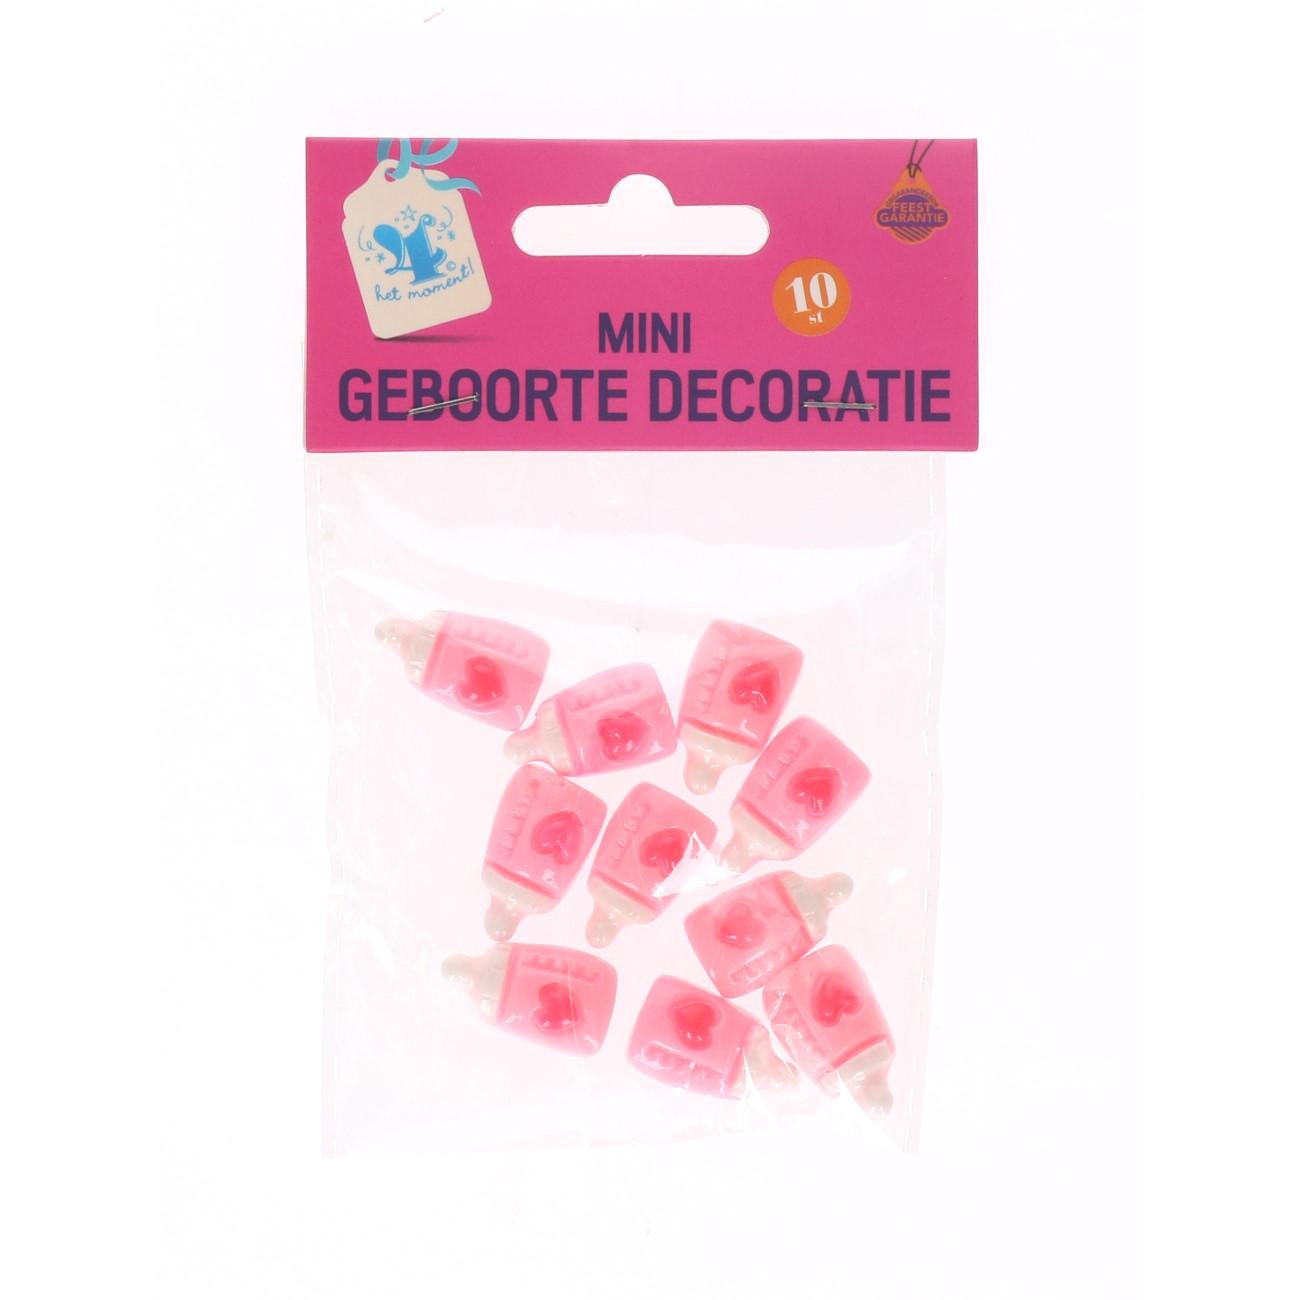 Mini geboorte decoratie roze #689